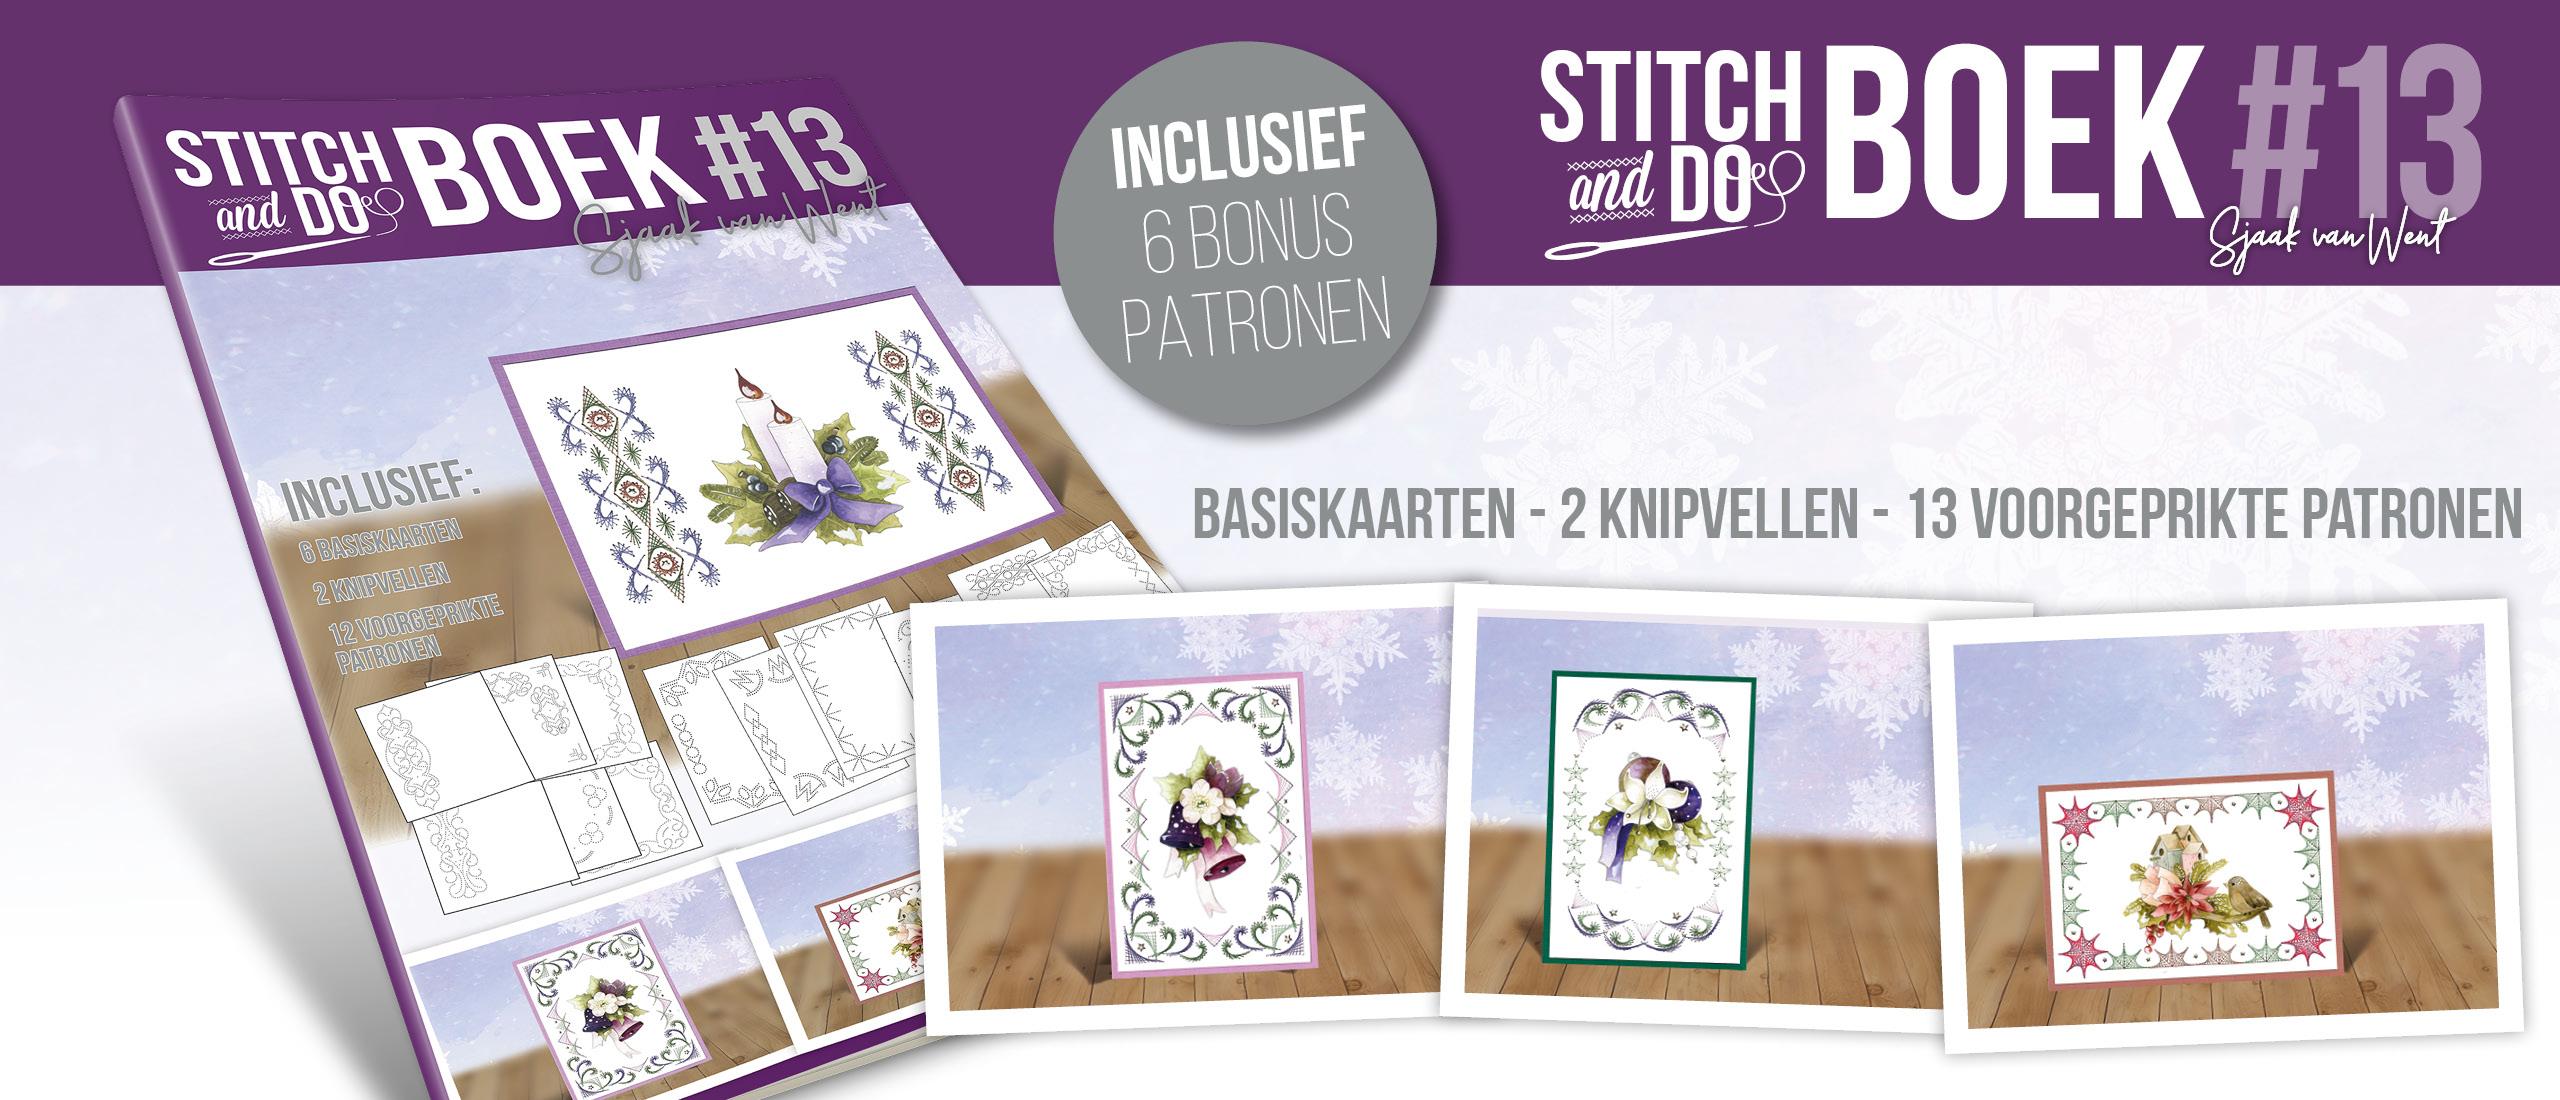 Stitch and Do Book 13 Sjaak van Went - STDOBB013